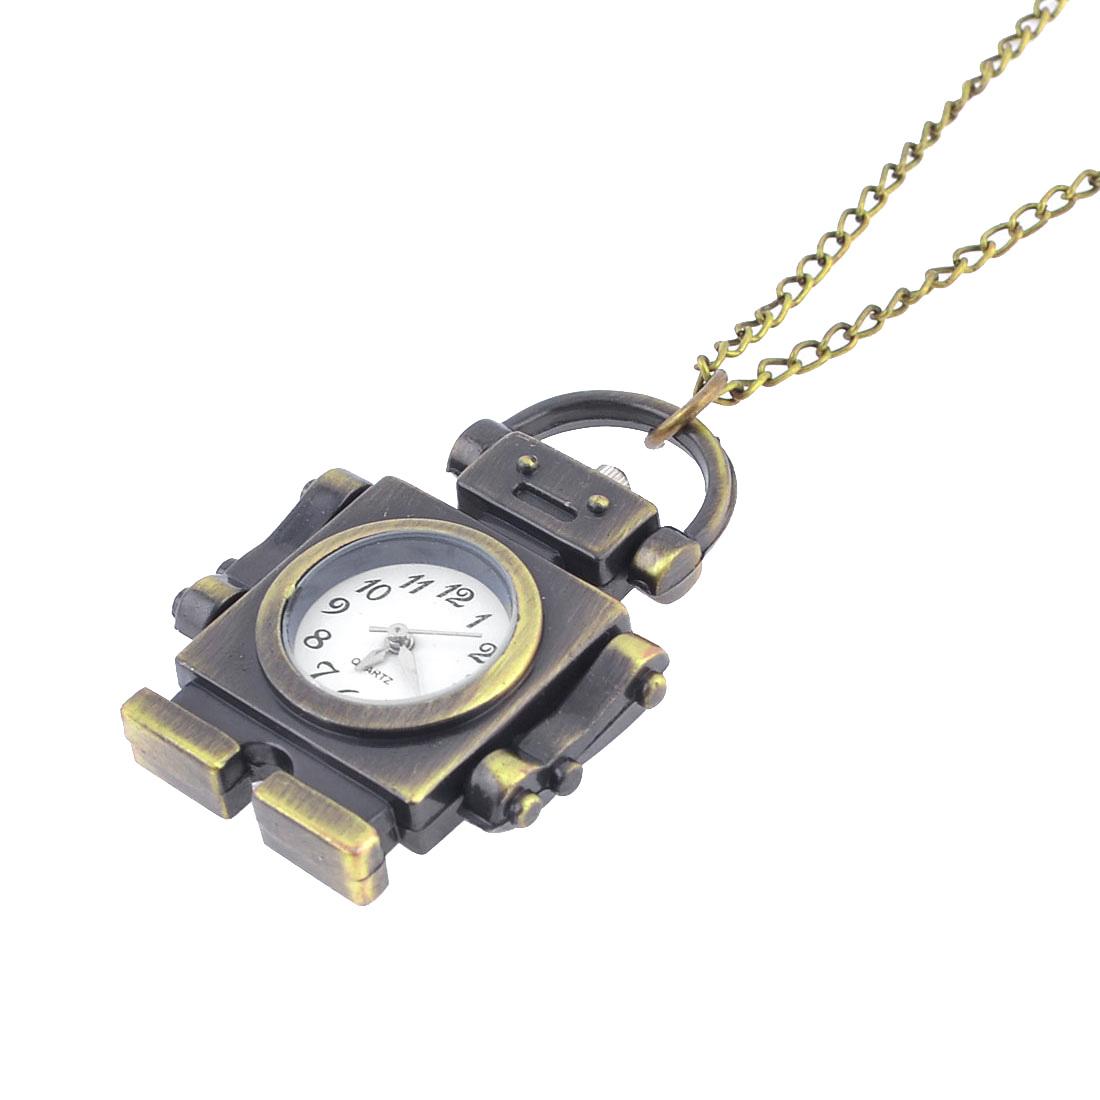 Metal Adjustable Strap Retro Style Robot Pendant Pocket Watch Bronze Tone